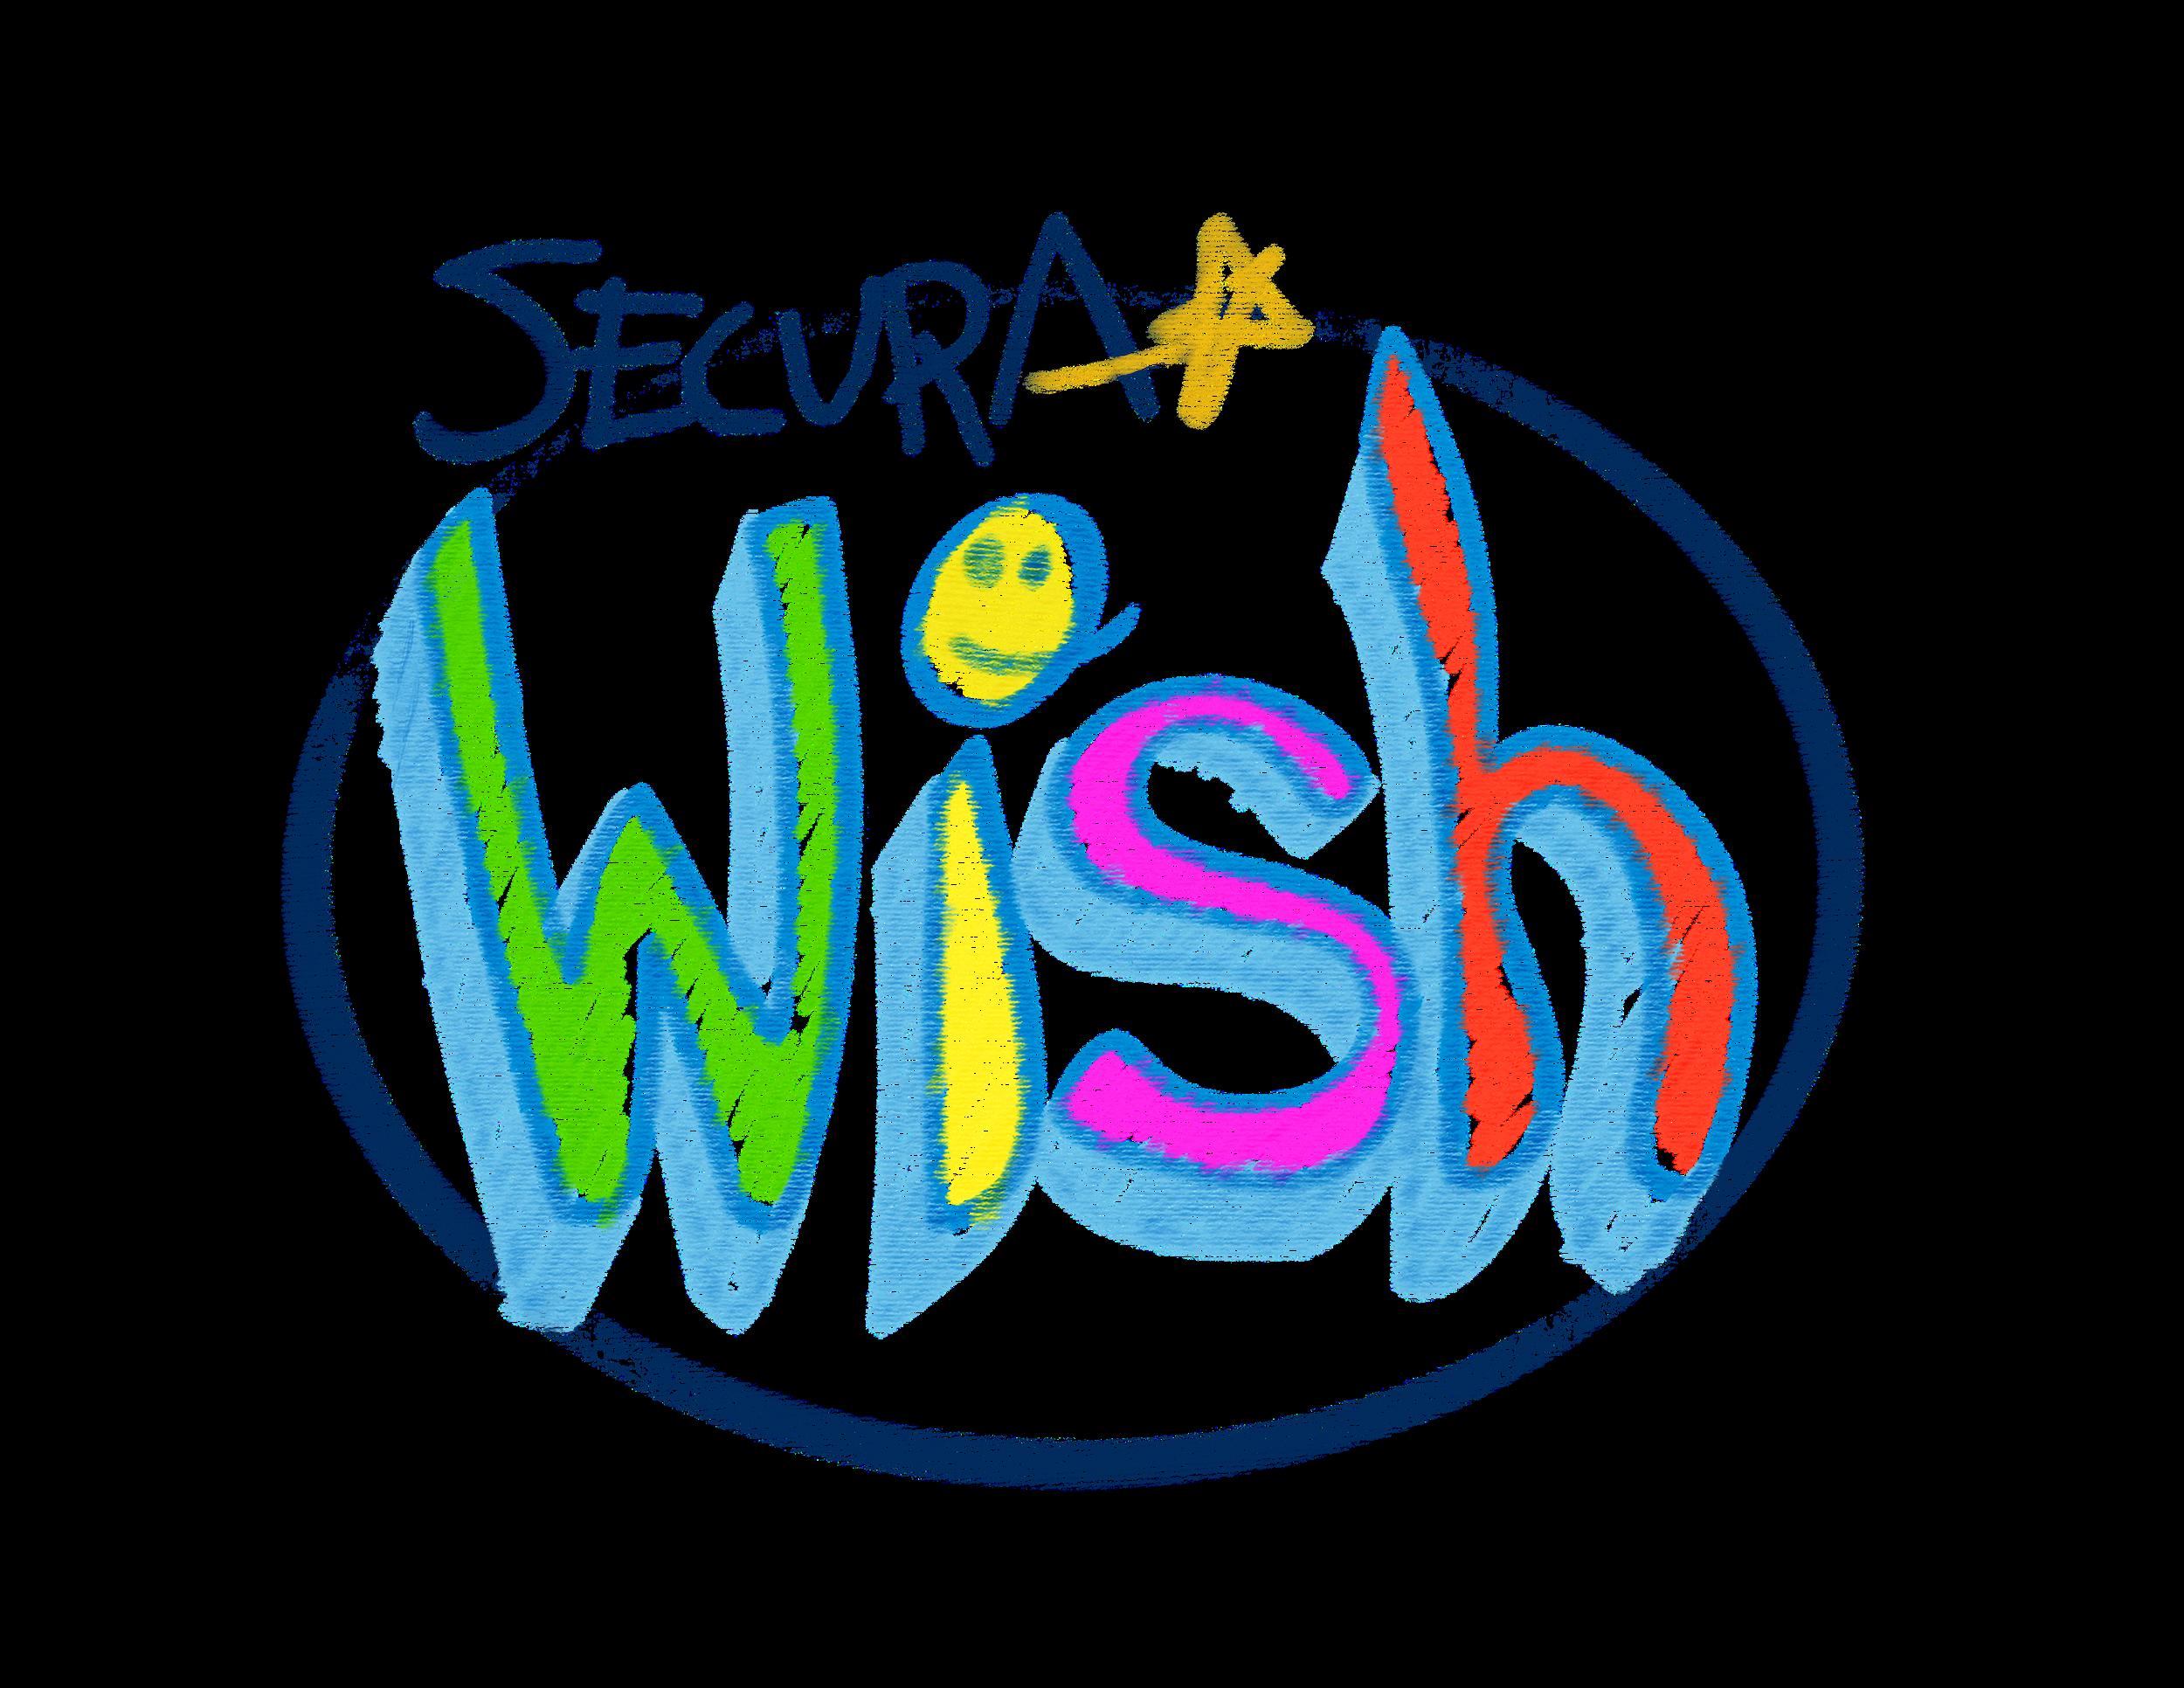 Secura Wish Logo